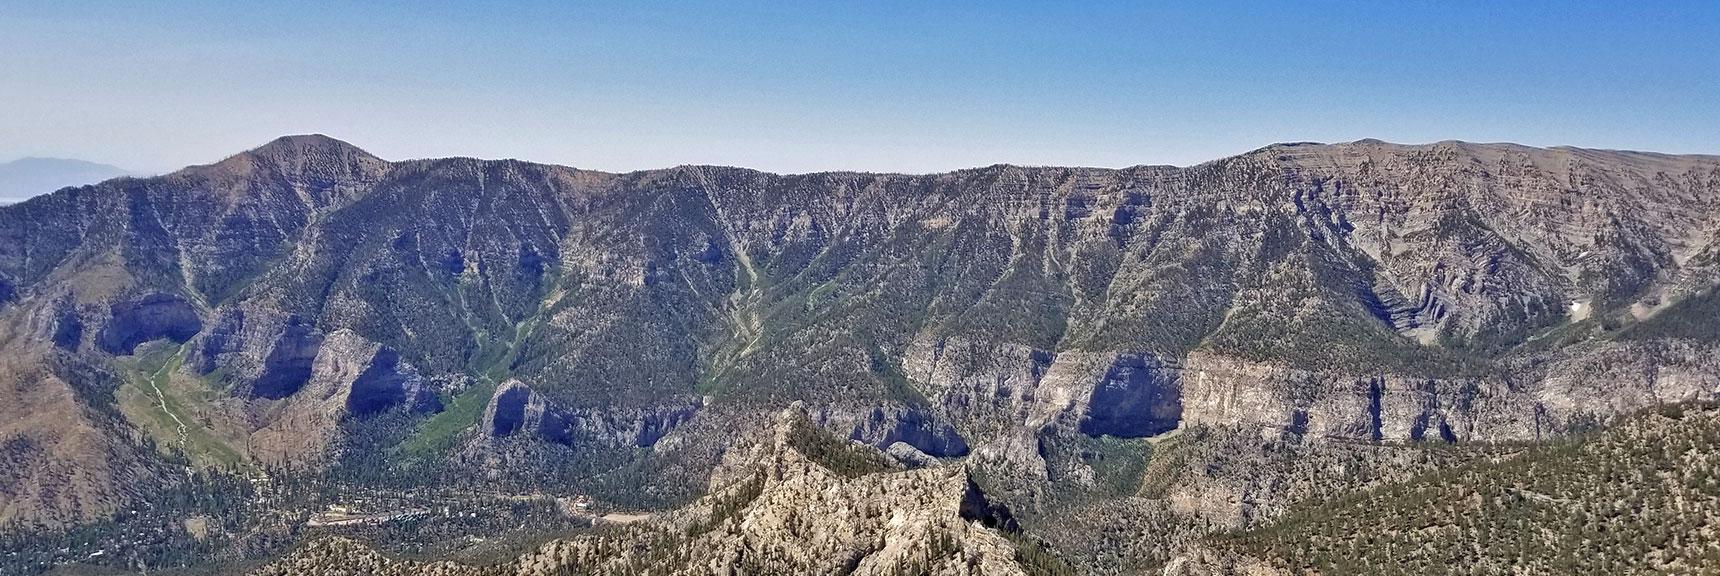 Griffith Peak and Kyle Canyon South Ridge Viewed from Mummy's Toe Summit   Mummy Mountain's Toe, Mt. Charleston Wilderness, Nevada